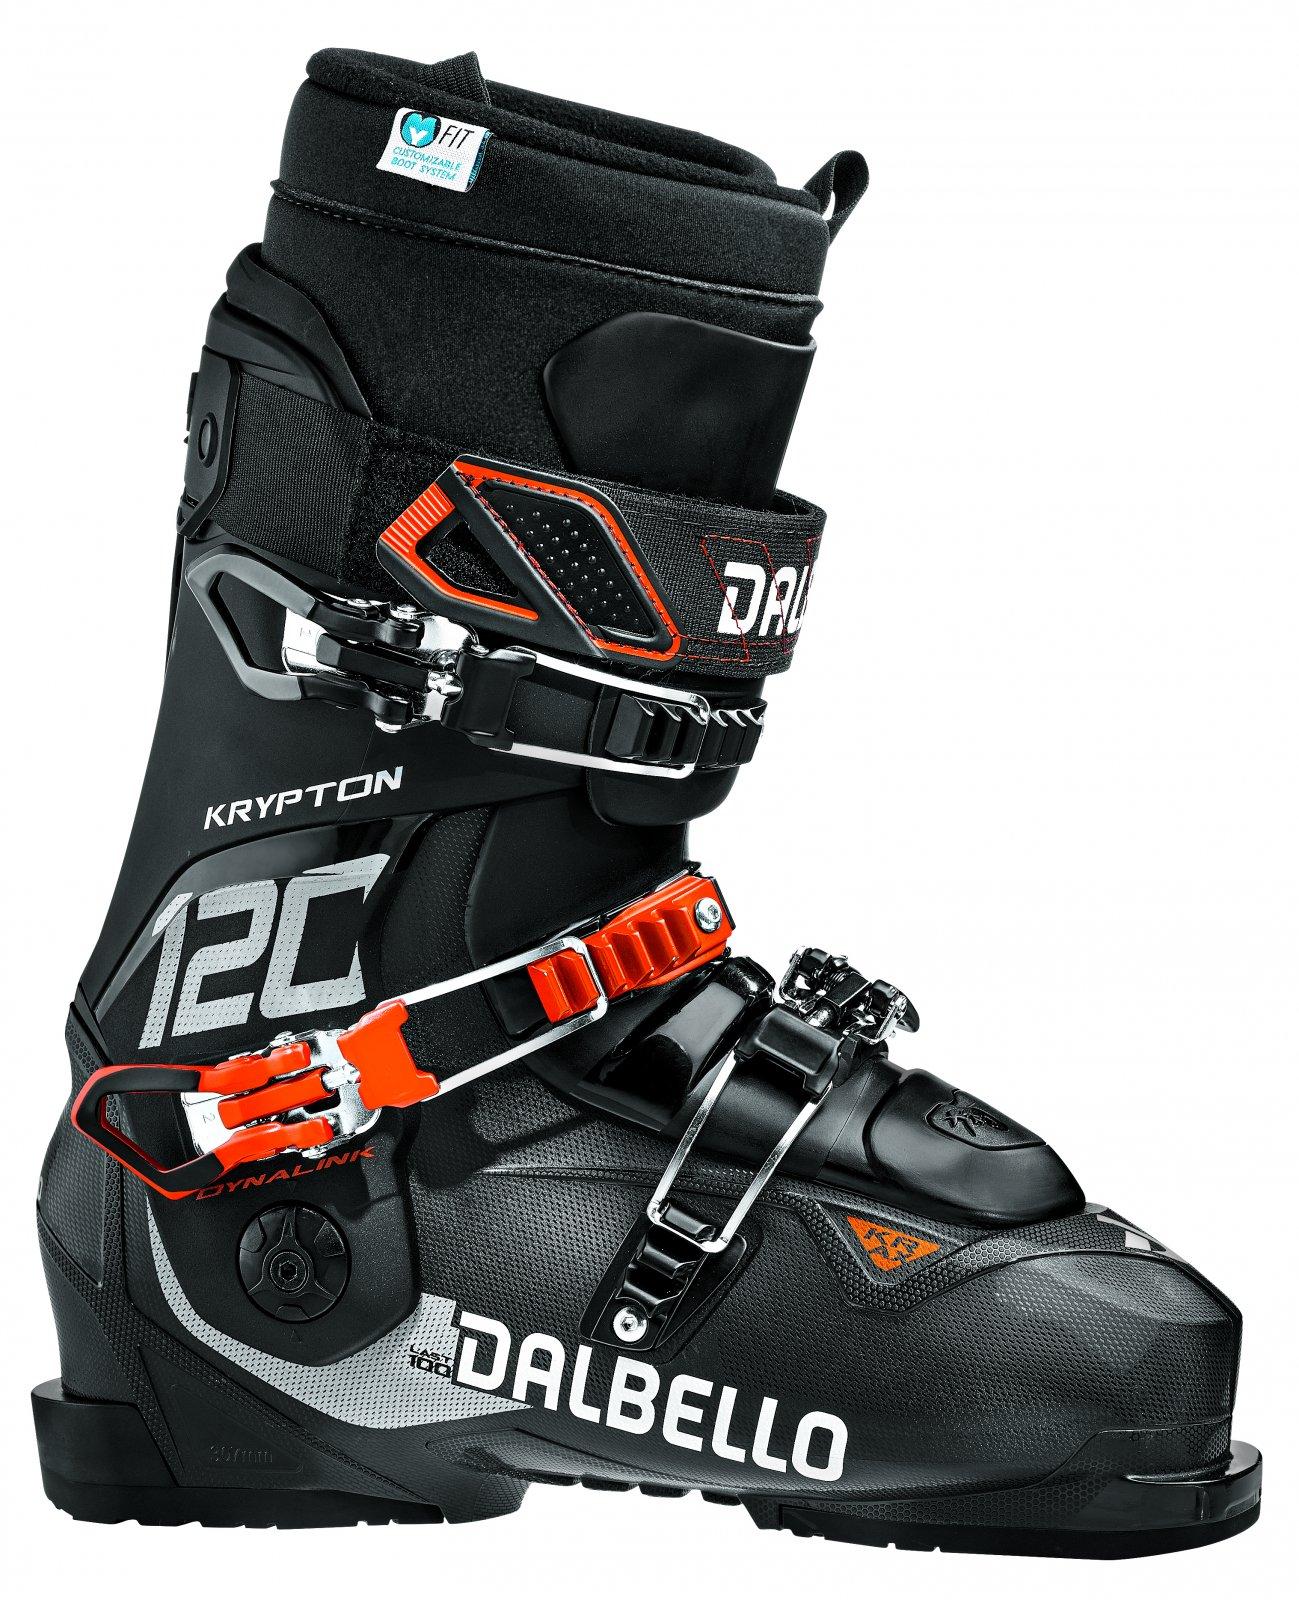 Dalbello Krypton AX 120 ID Ski Boots 2020